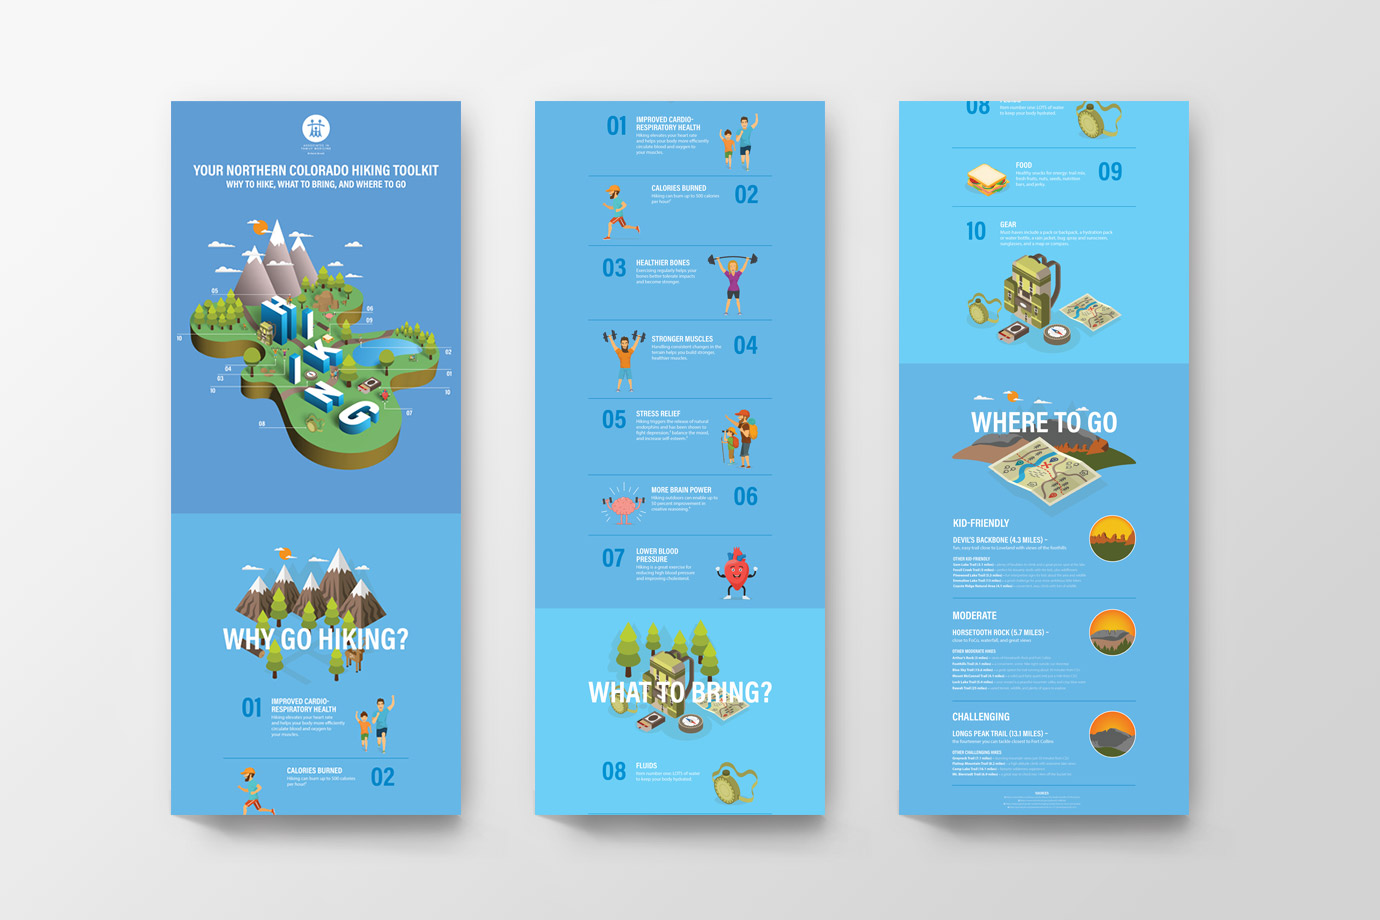 BON_AFM_infographic.jpg